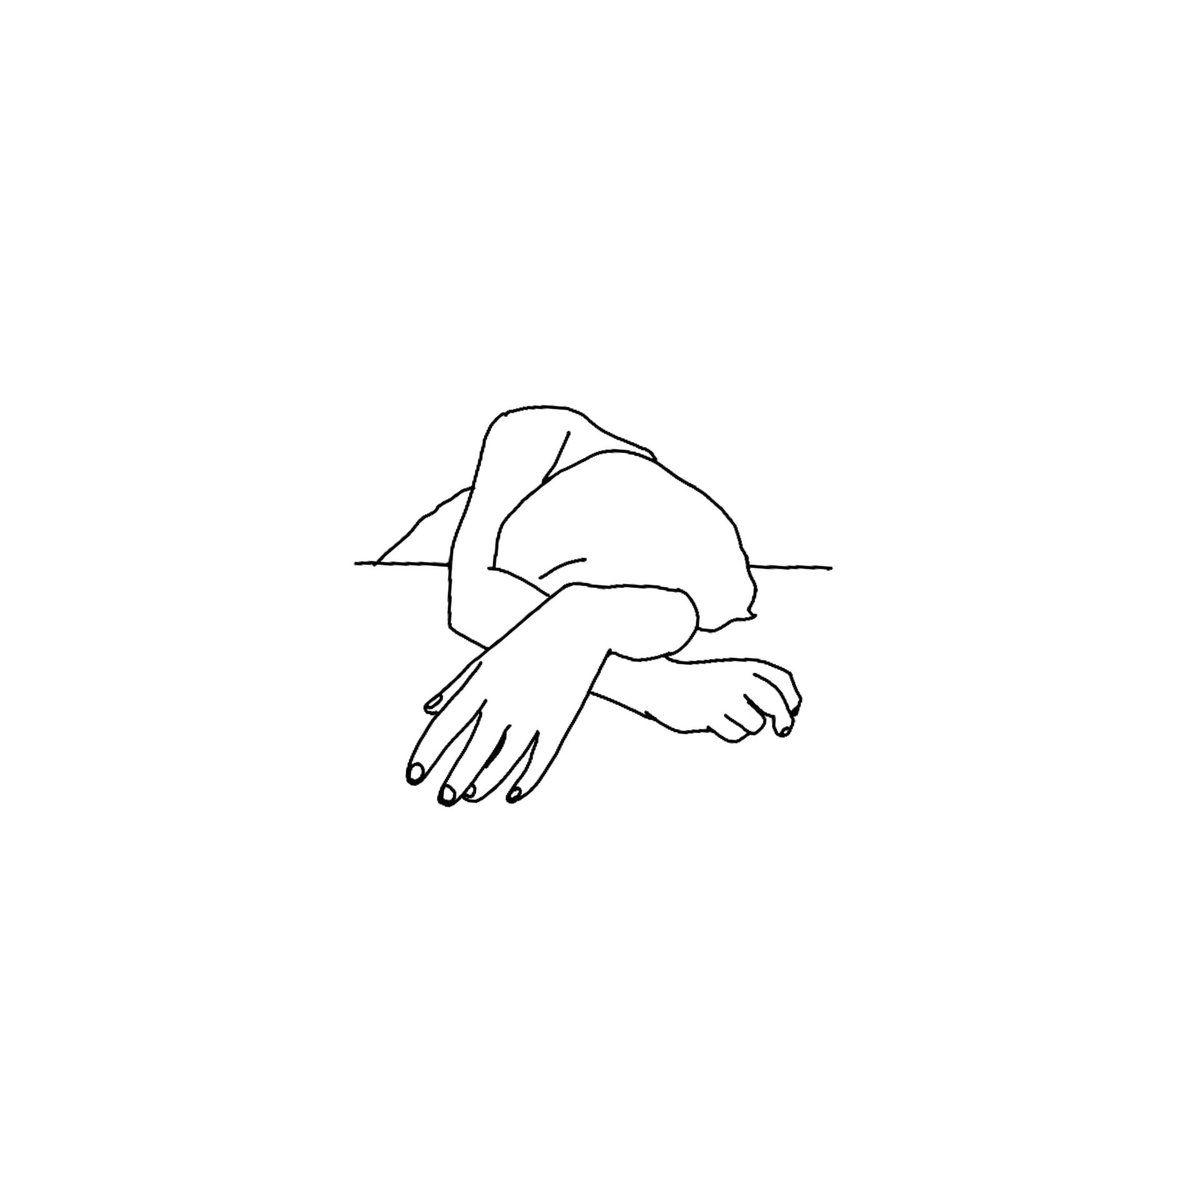 cad5b310768a7c565776f553c3ffd730 » Sad Tumblr Drawing Aesthetic